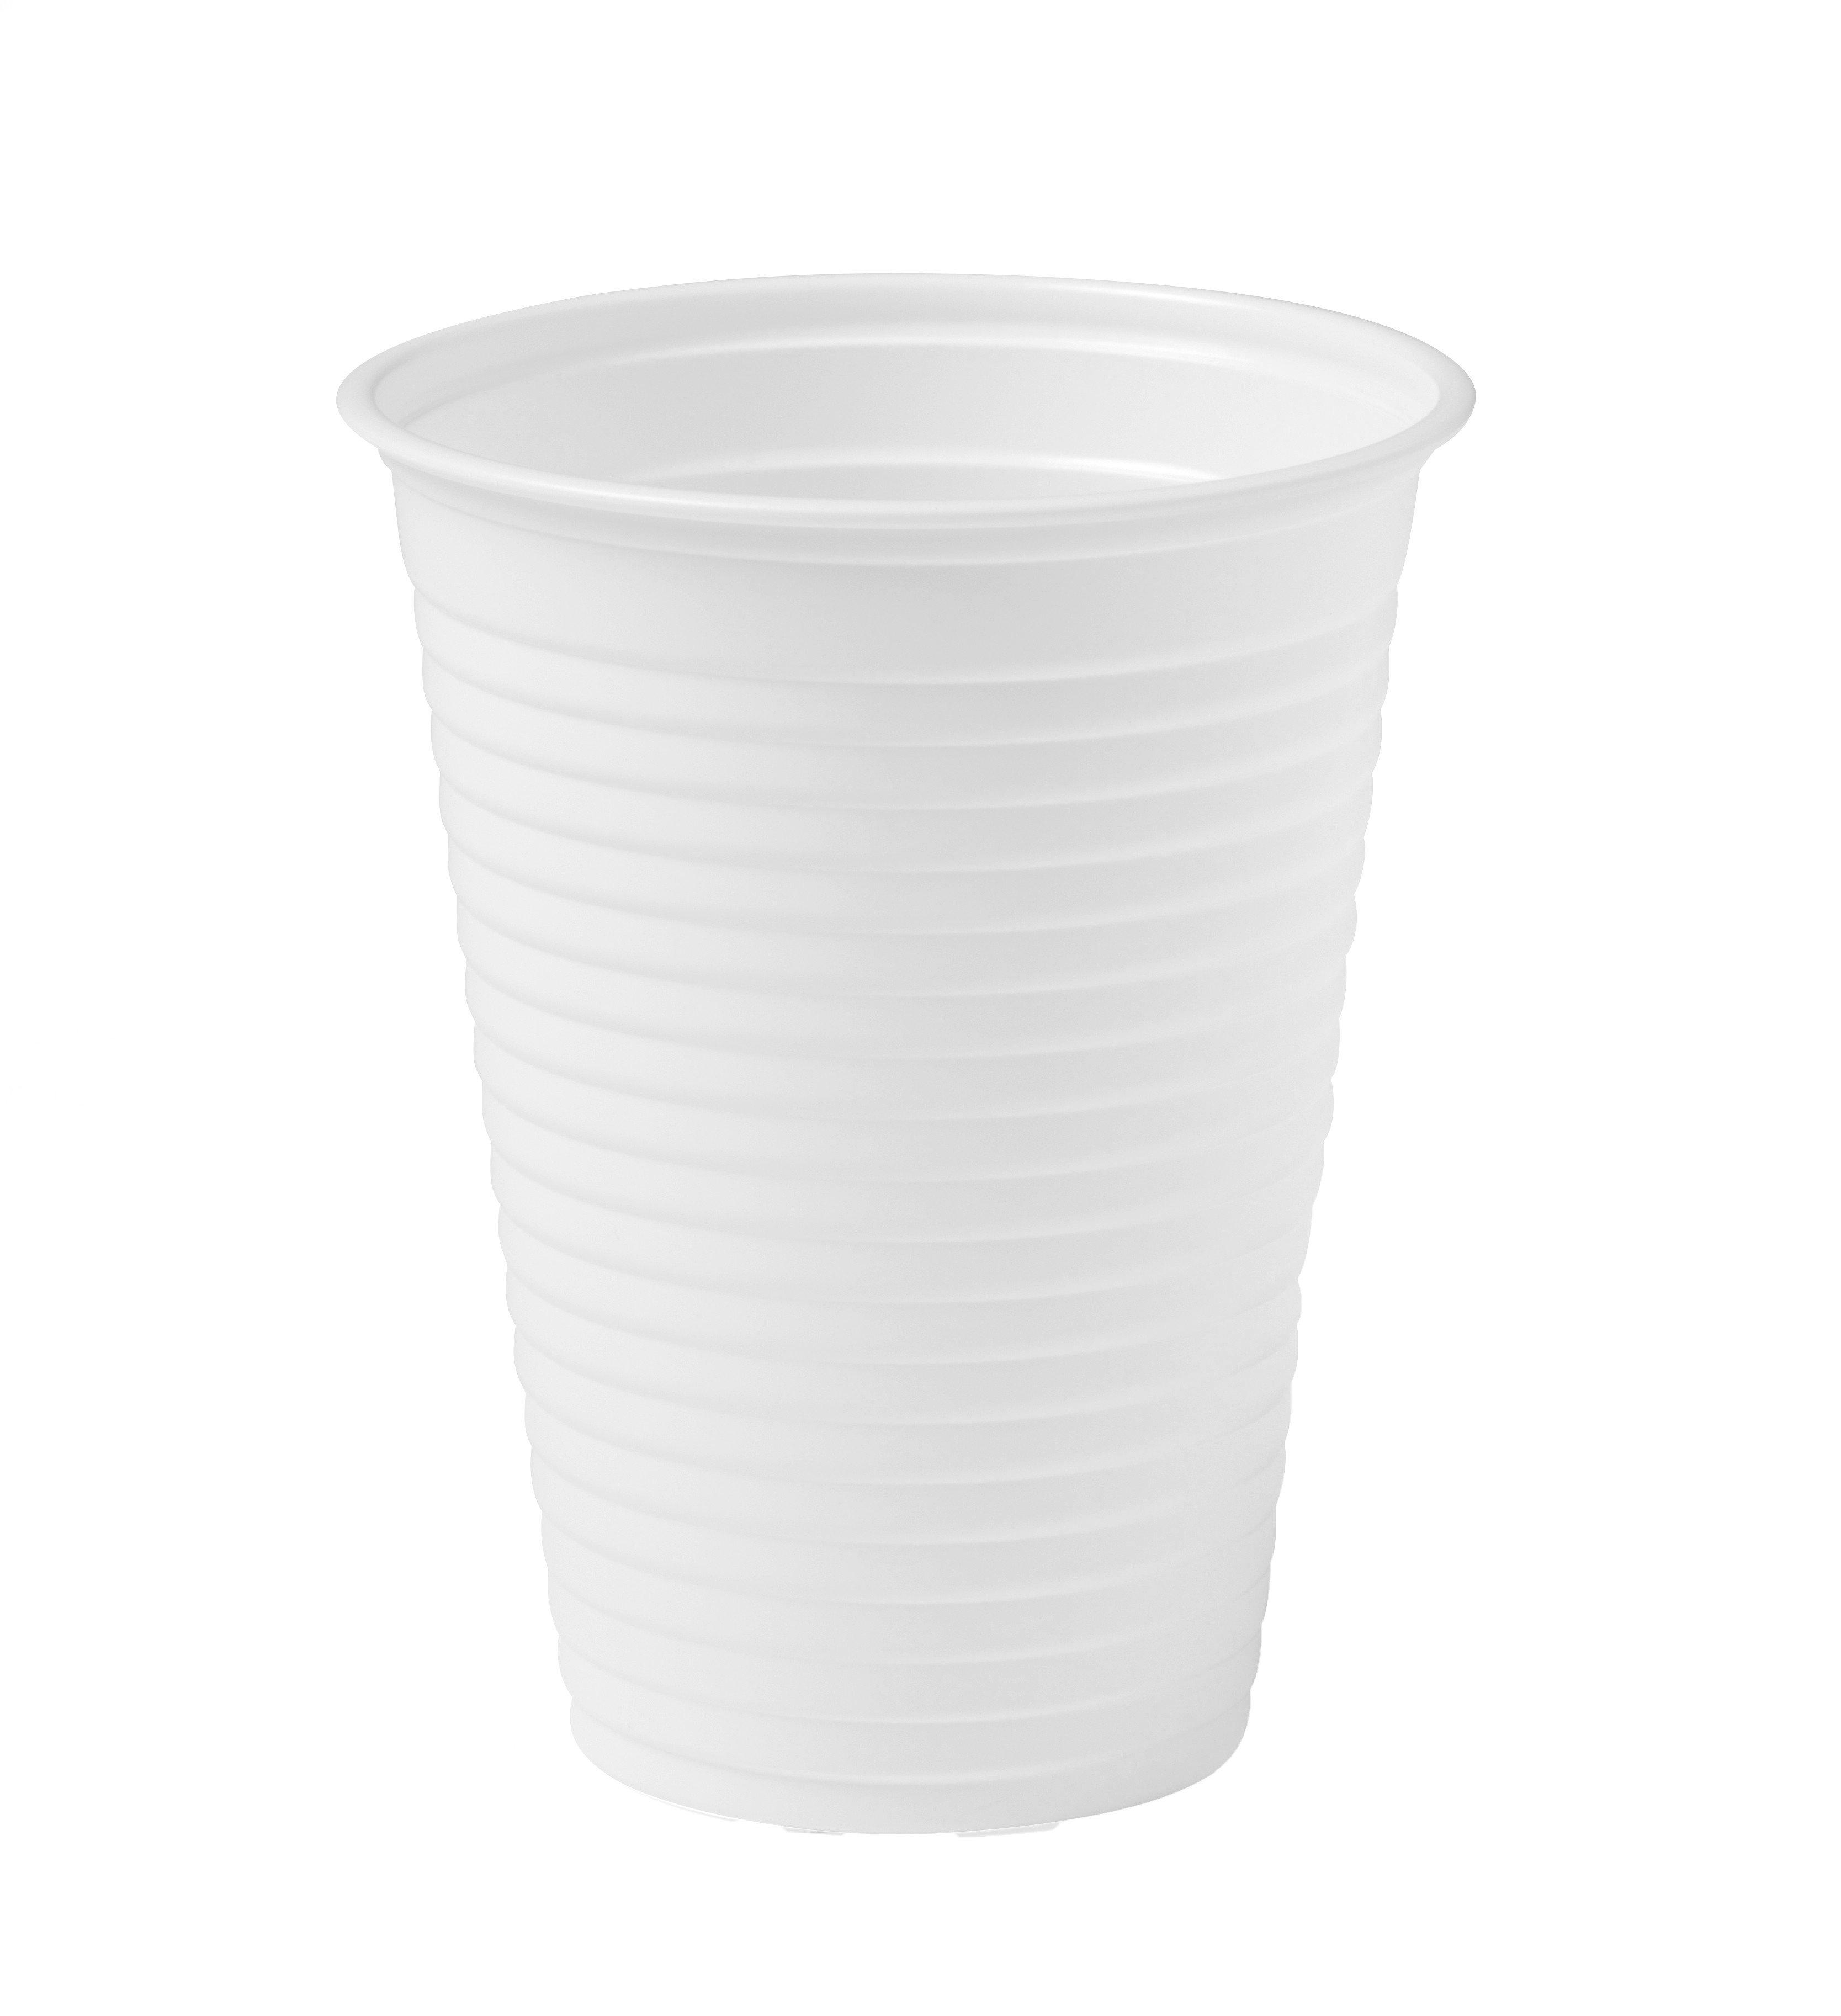 Drinkbeker | 180 ml | Wit | 3000 stuks